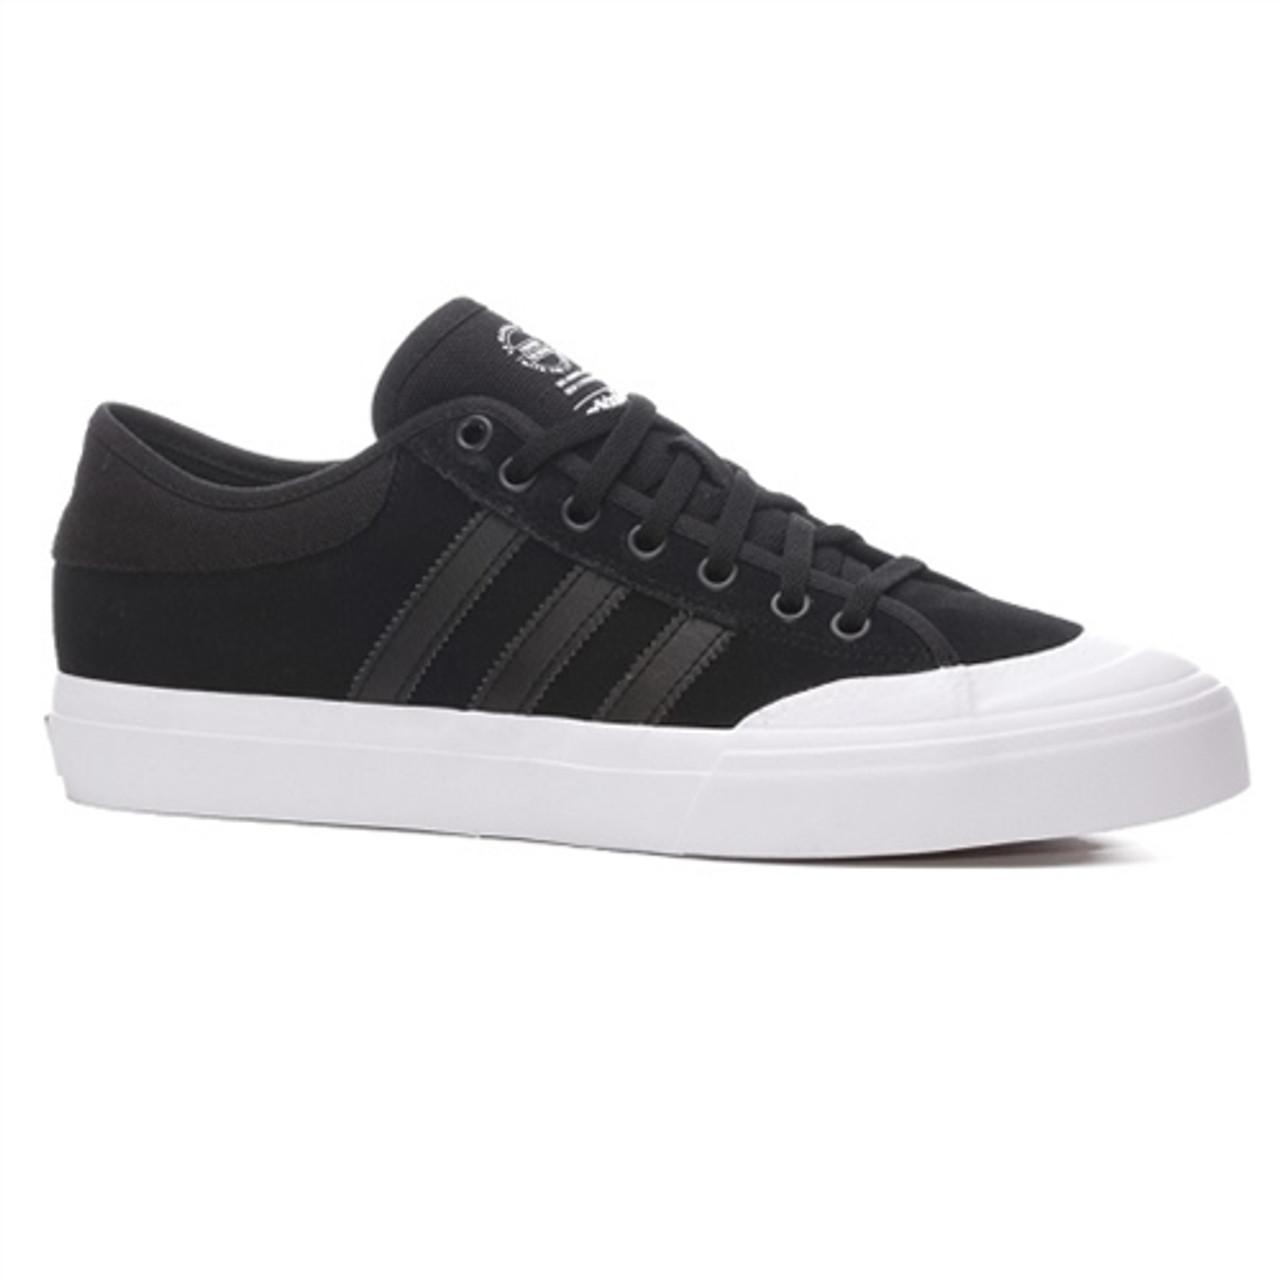 Adidas Matchcourt Low Skate Shoes Black